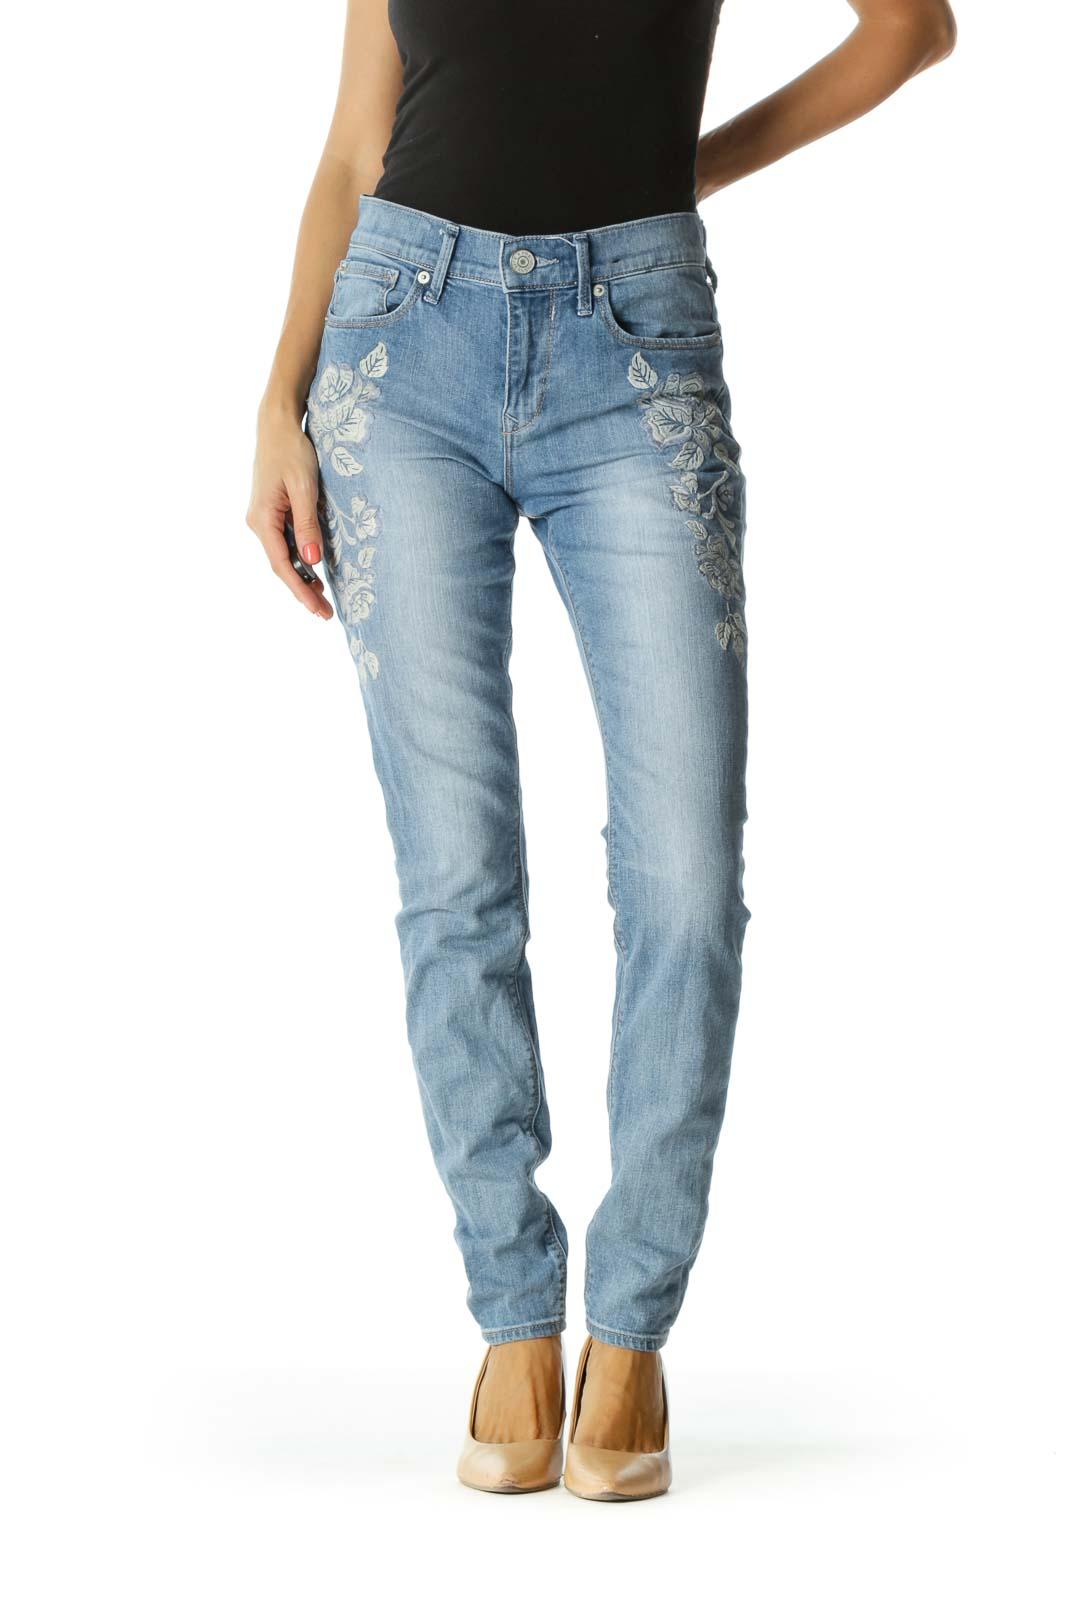 Blue Light-Wash Floral Embroidered Jeans Front